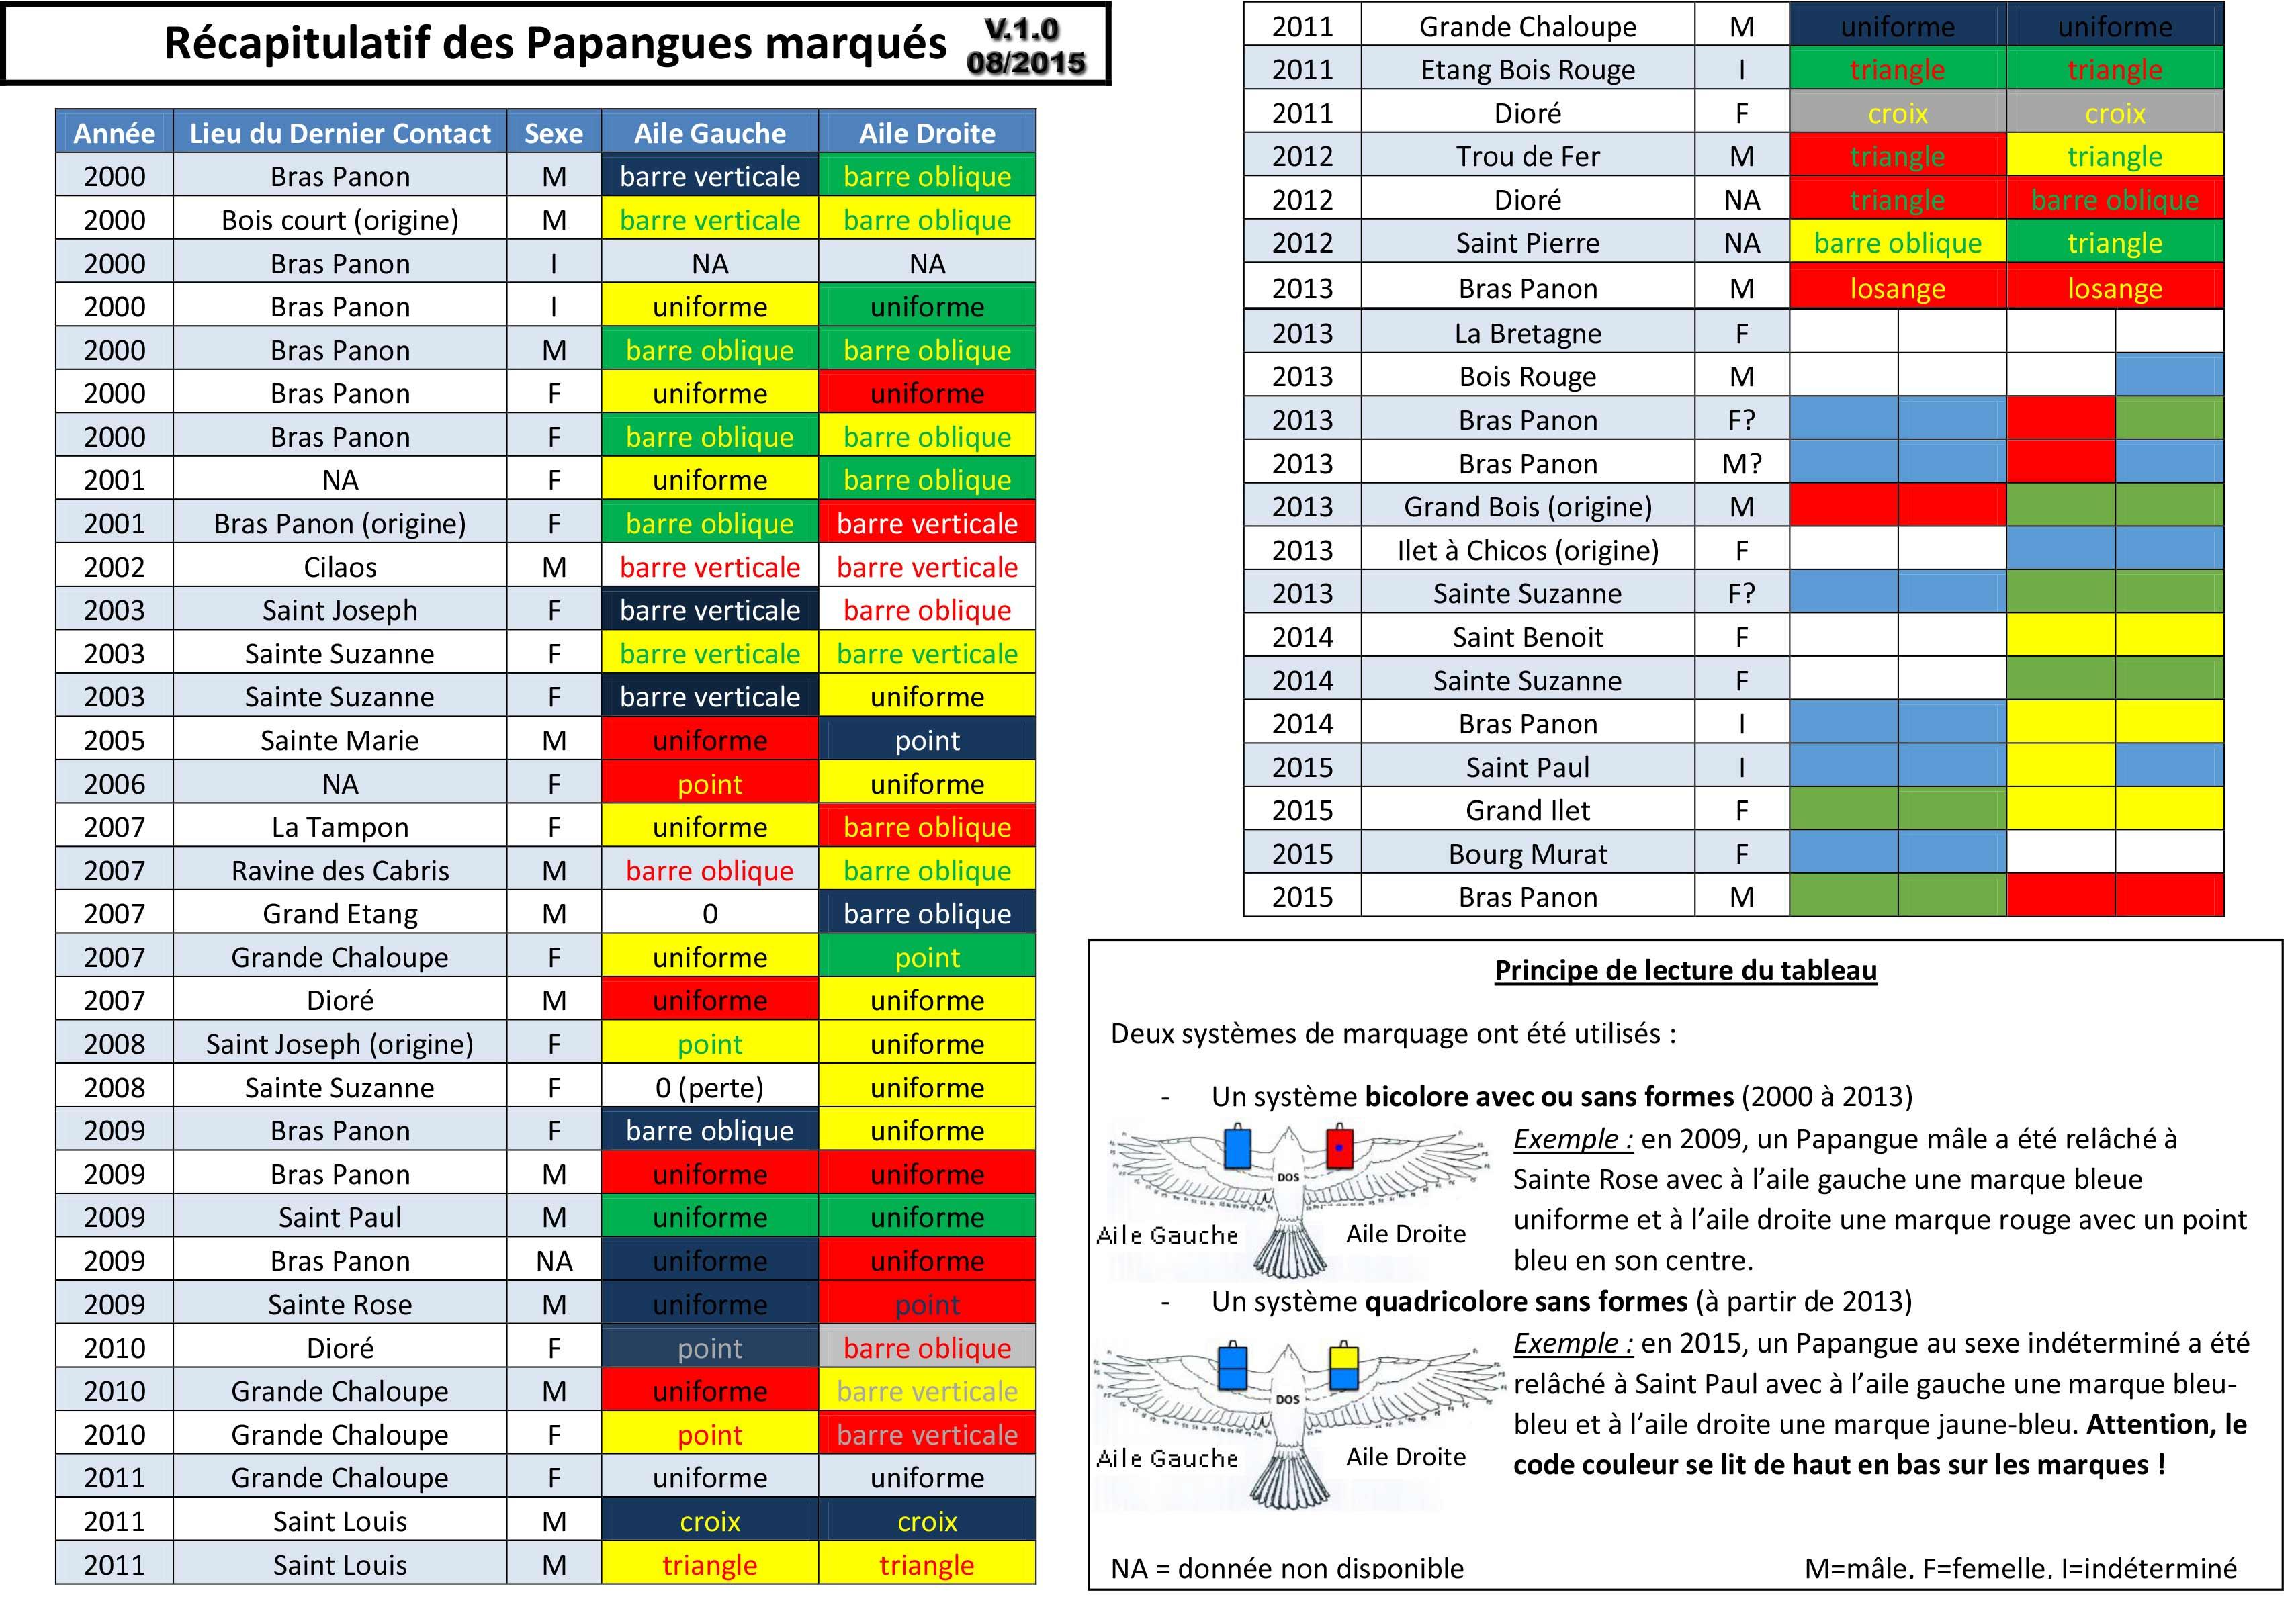 marquage papangue tableau recap v.1.0